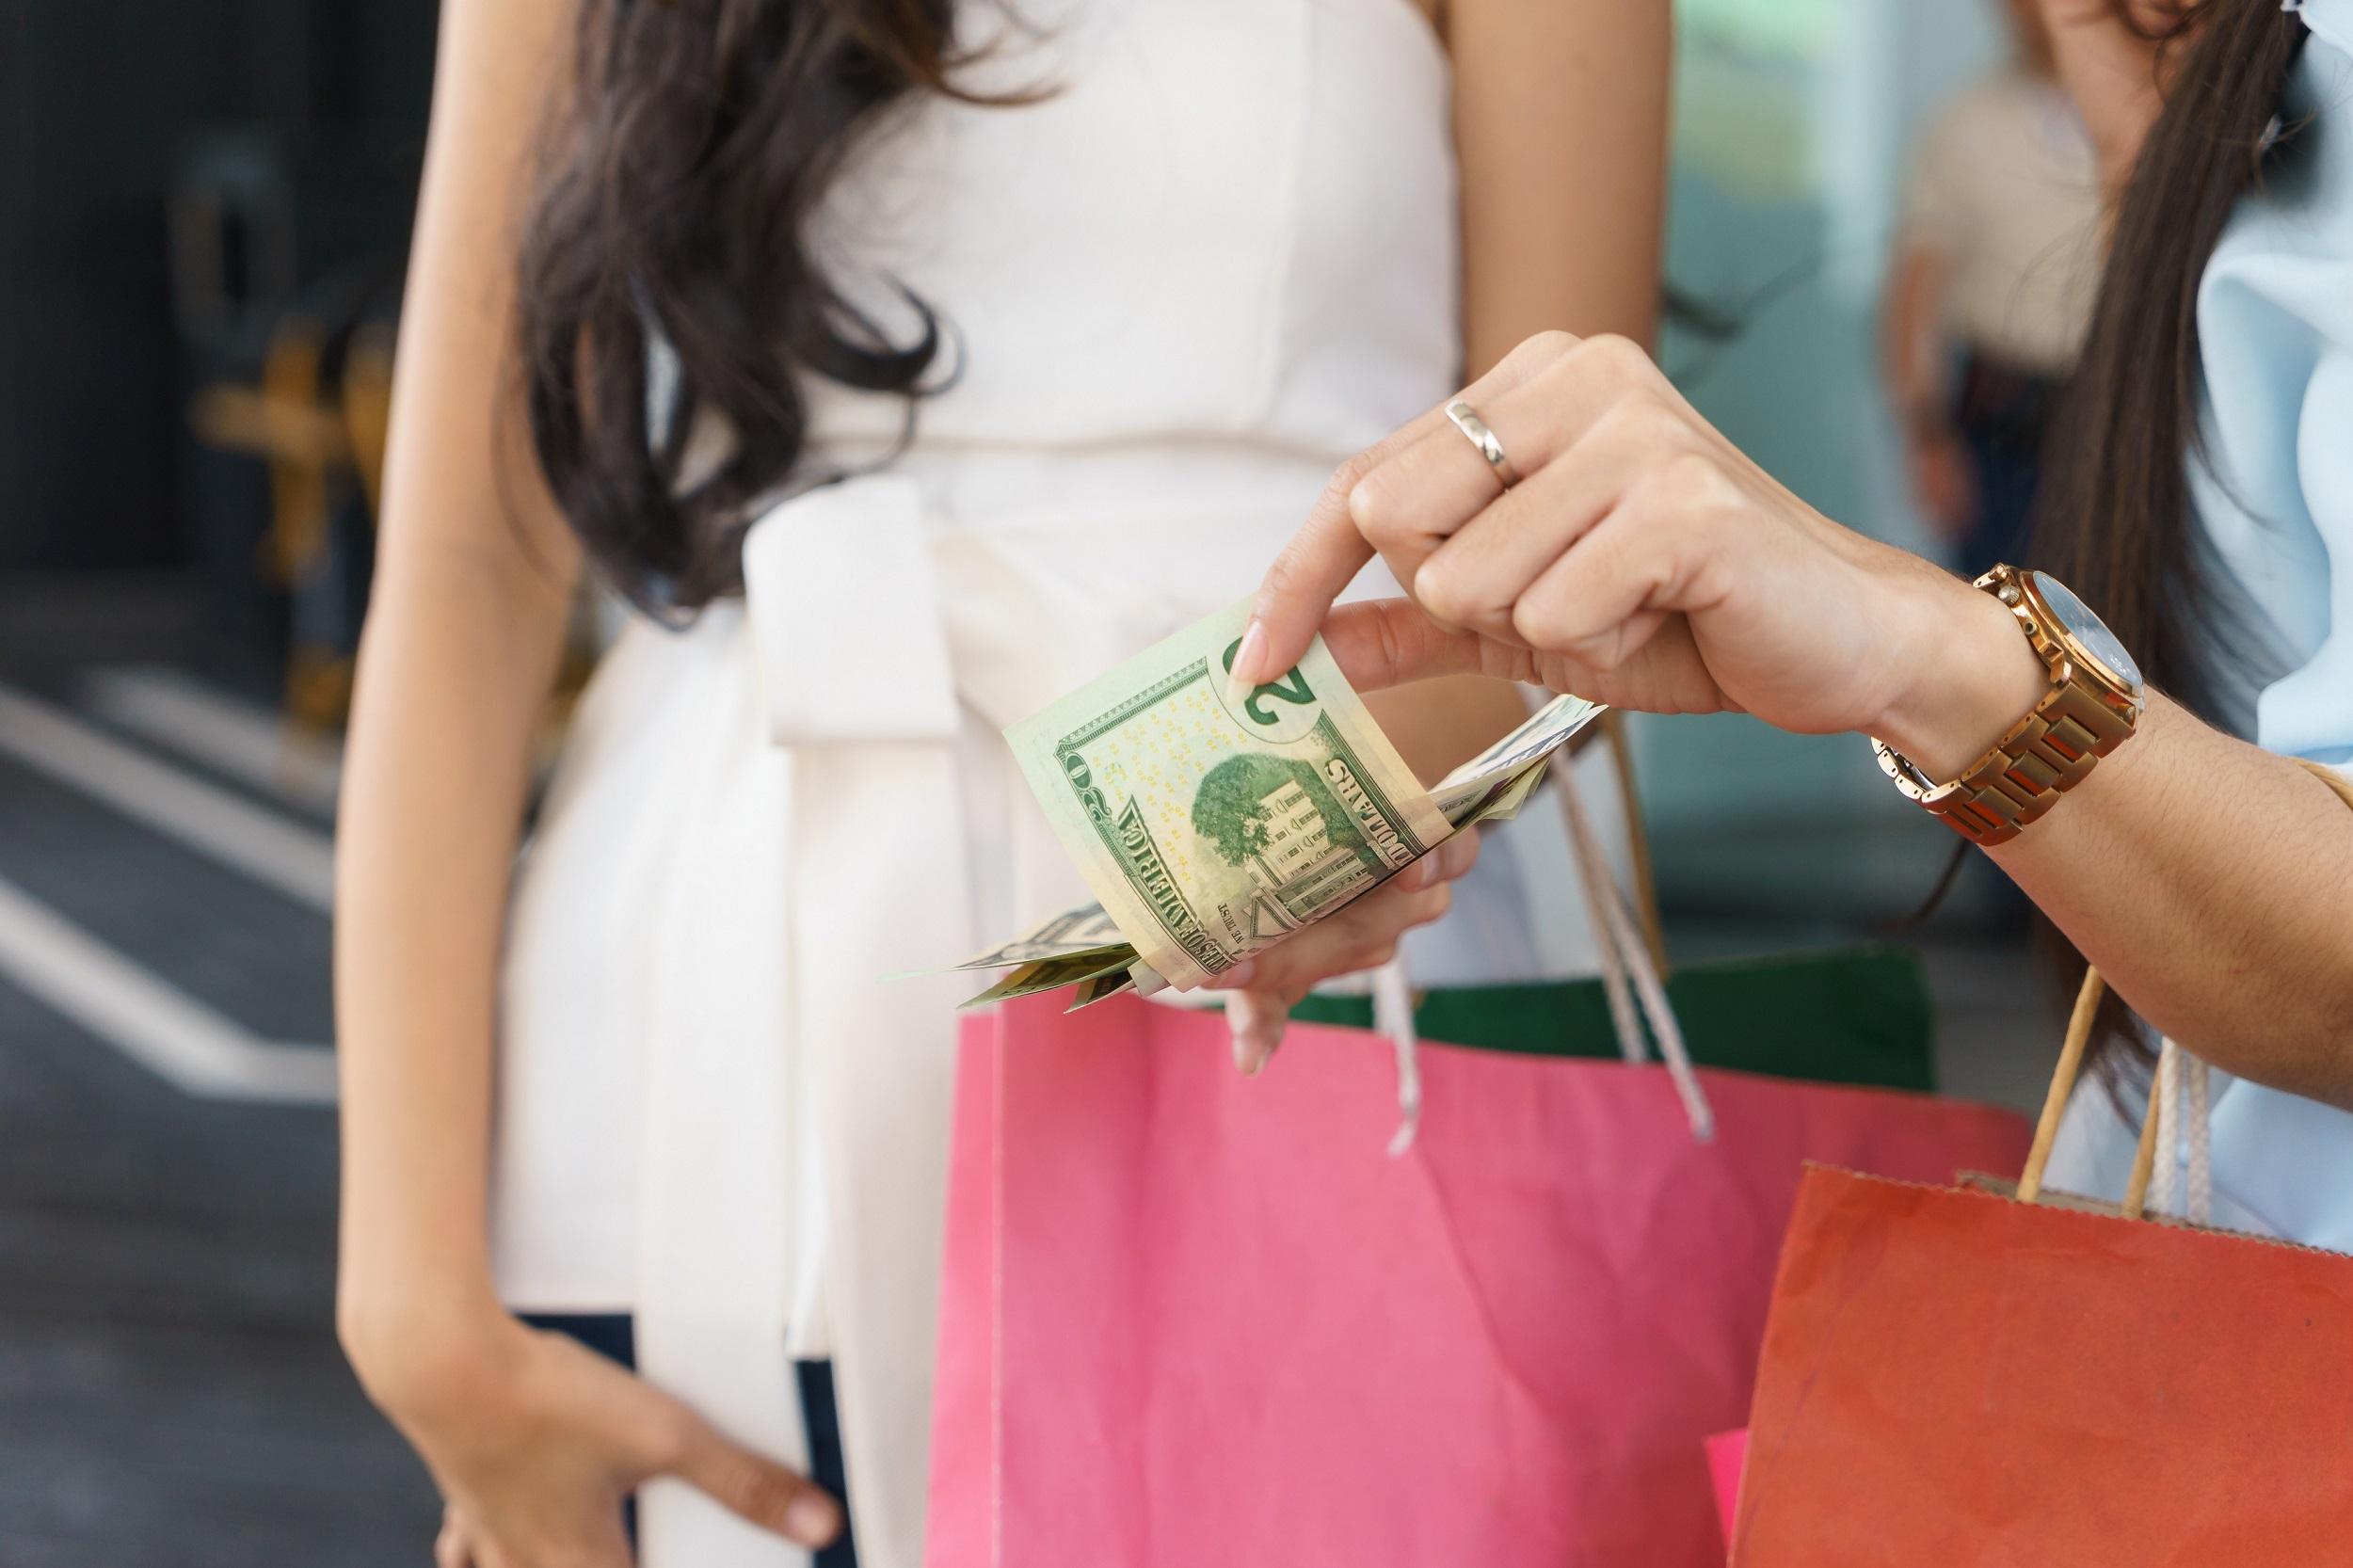 Borrowing Money from a Friend